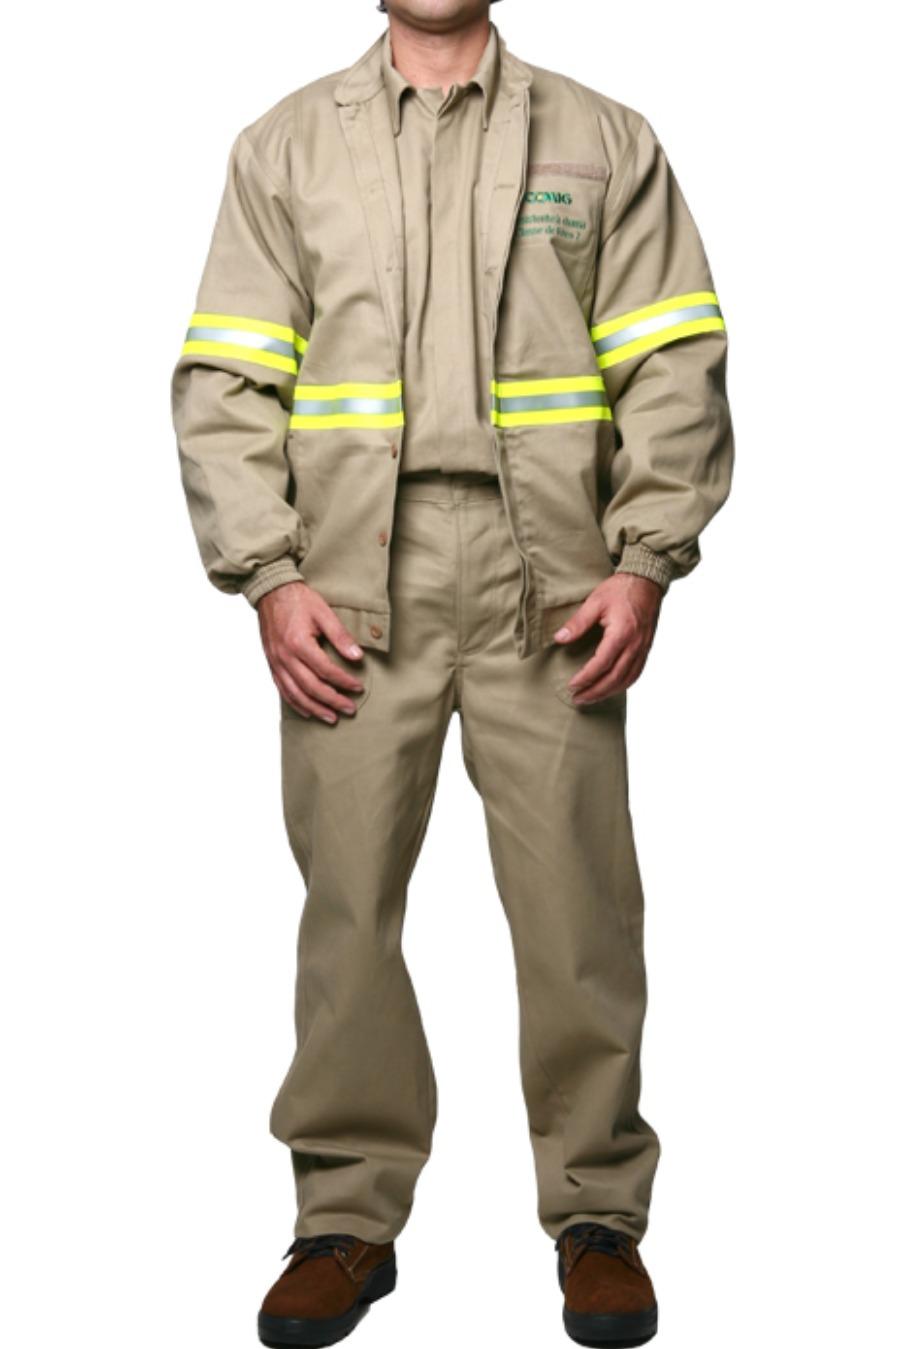 Jaqueta de Segurança 8,9 CAL/CM² - Risco II